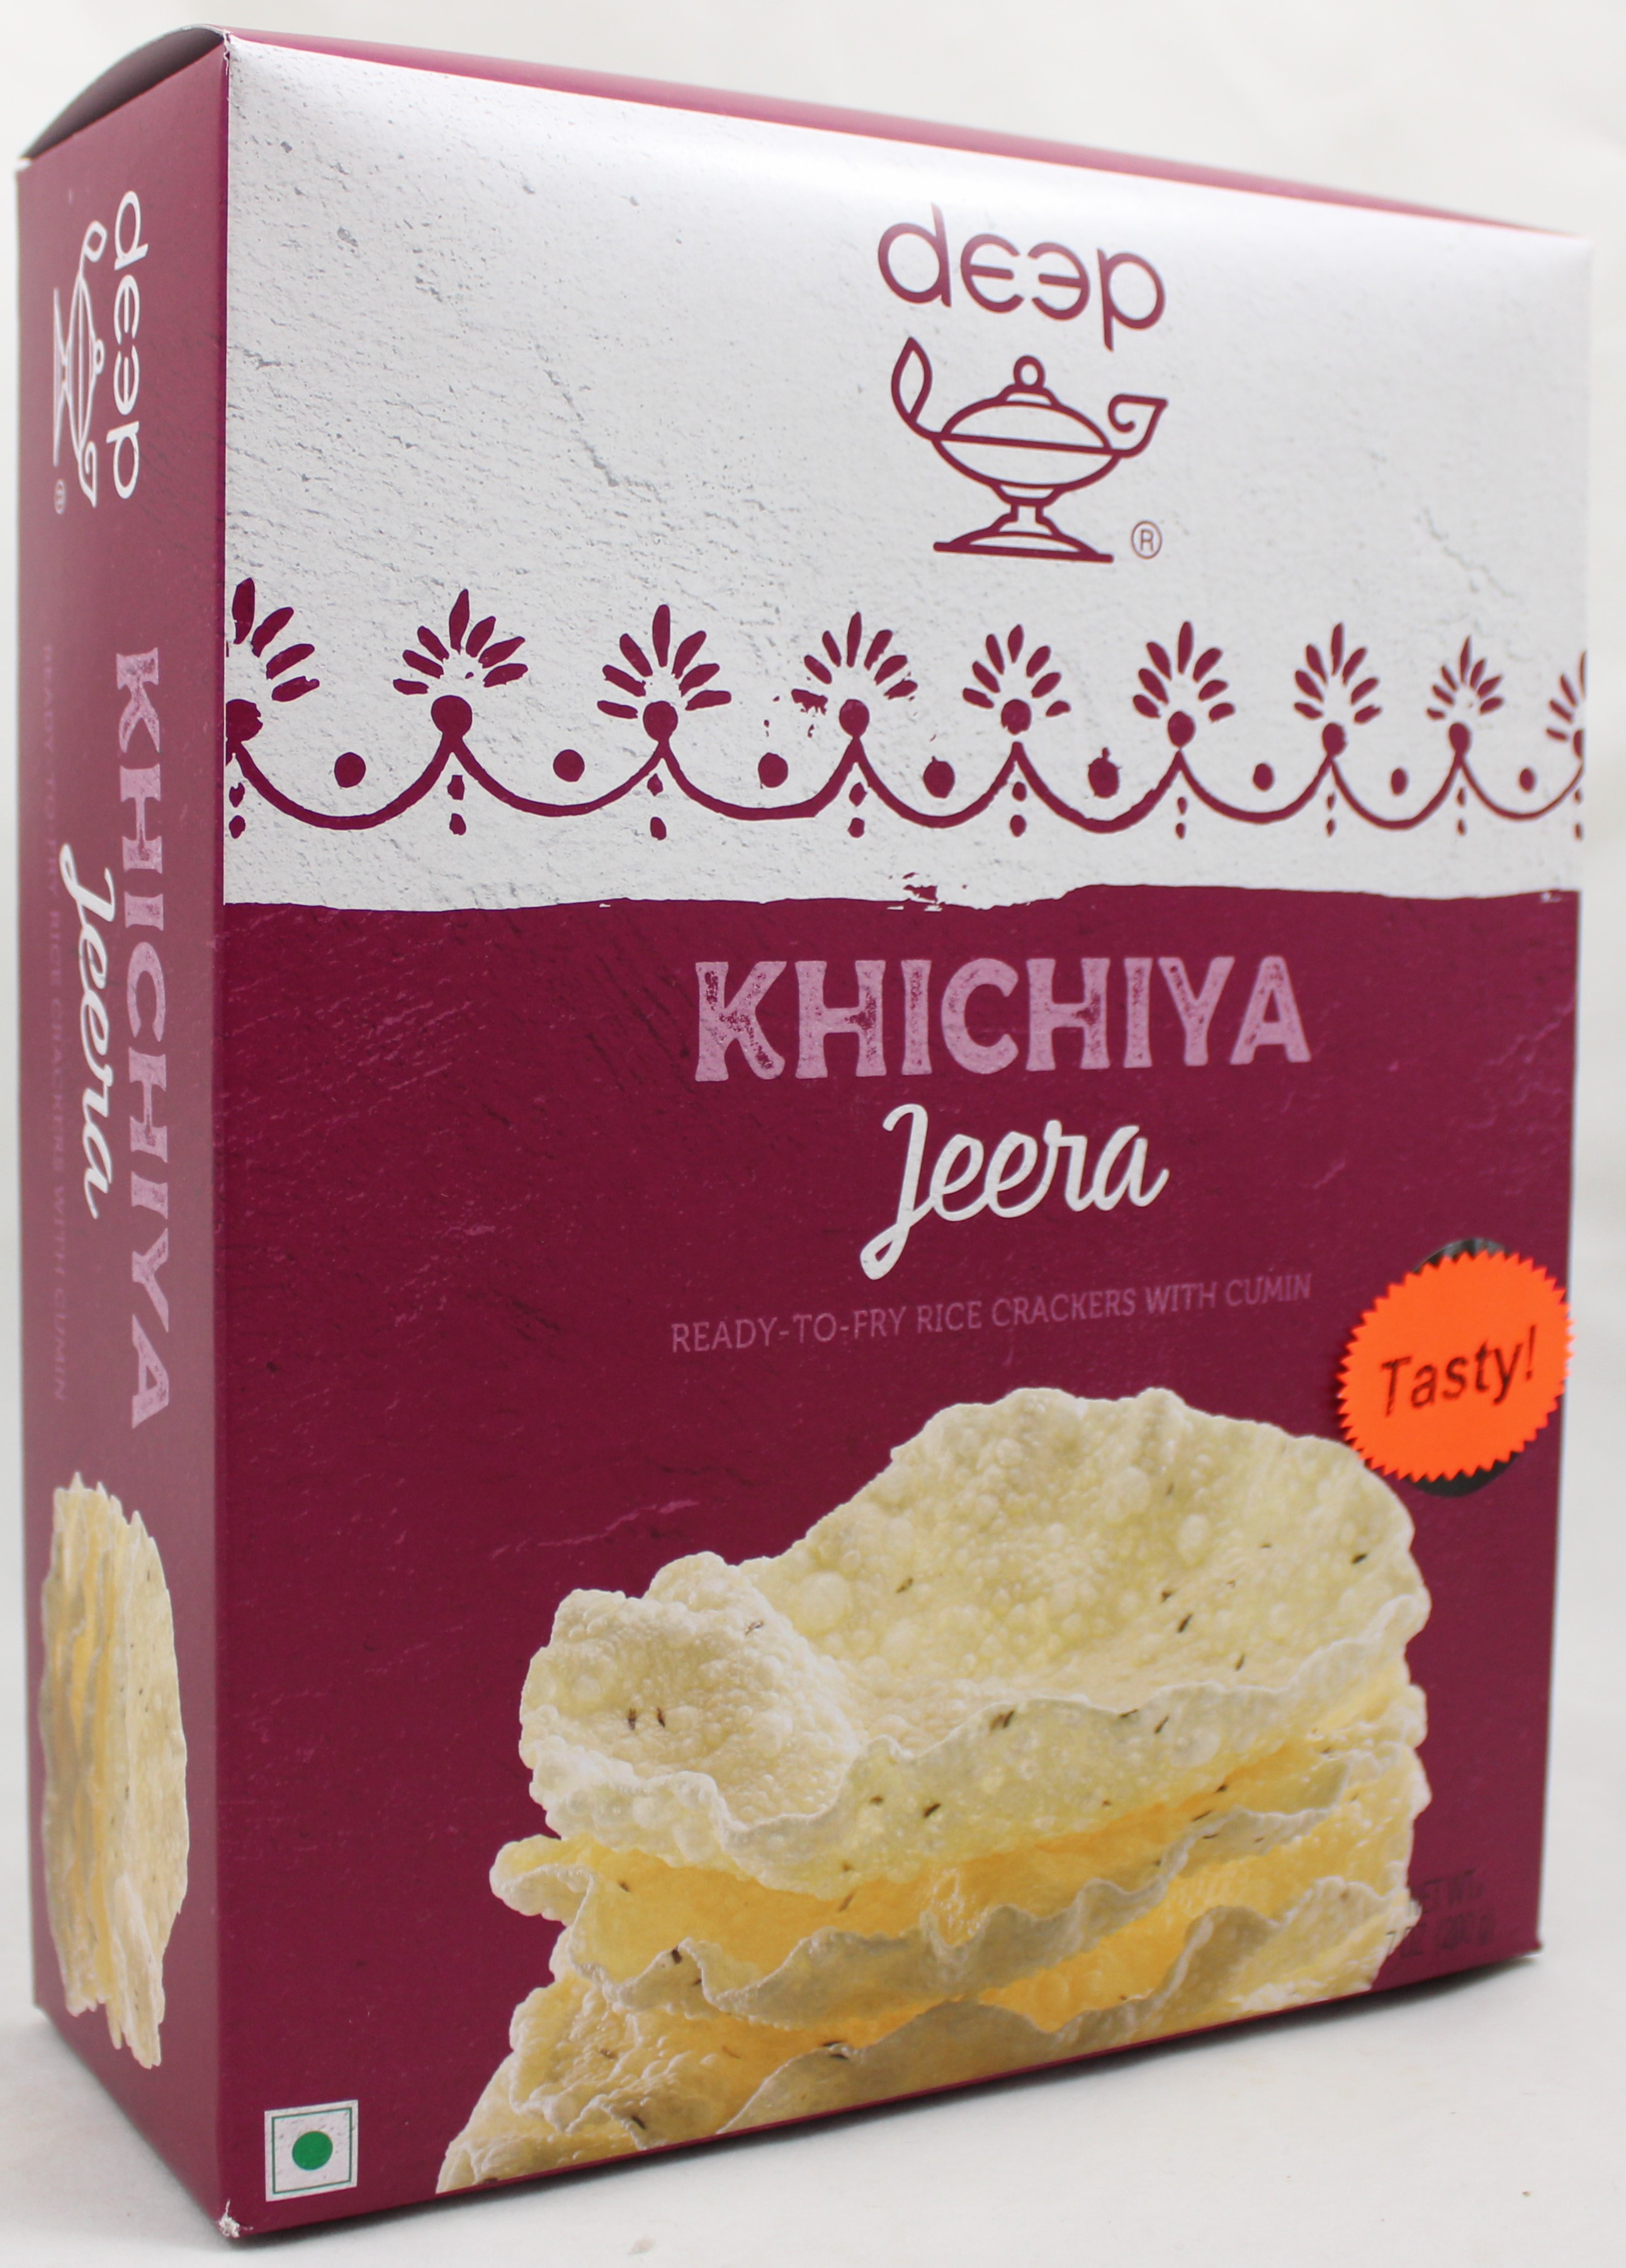 Jeera Khichiya 7oz